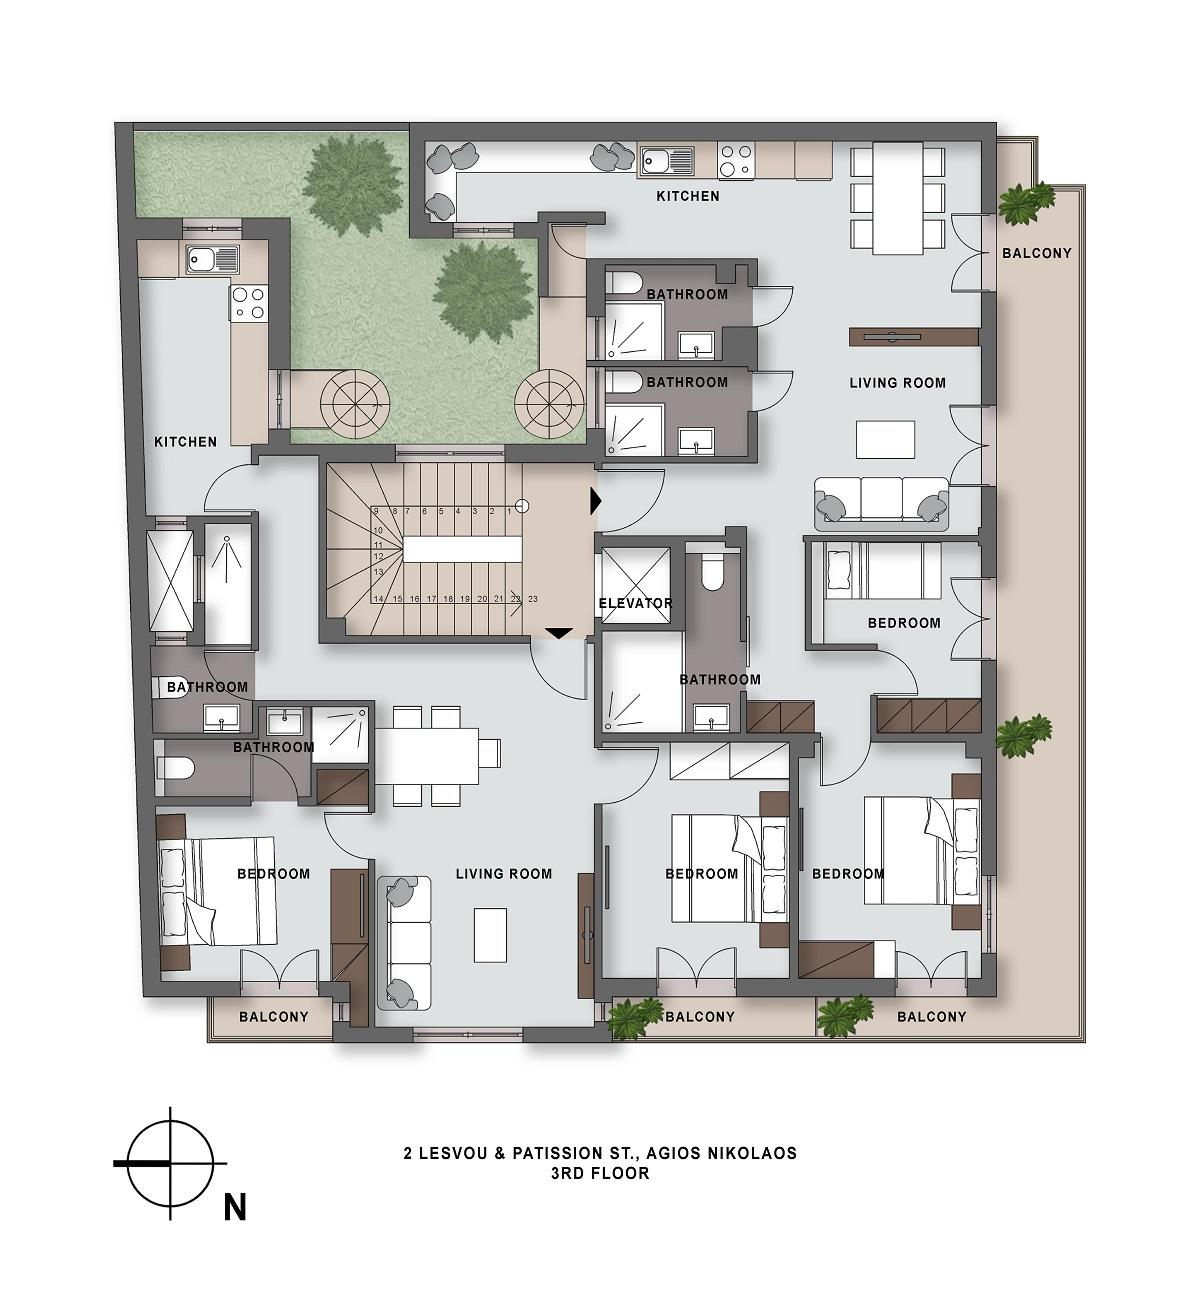 Lesvou 2 3rd floor plan